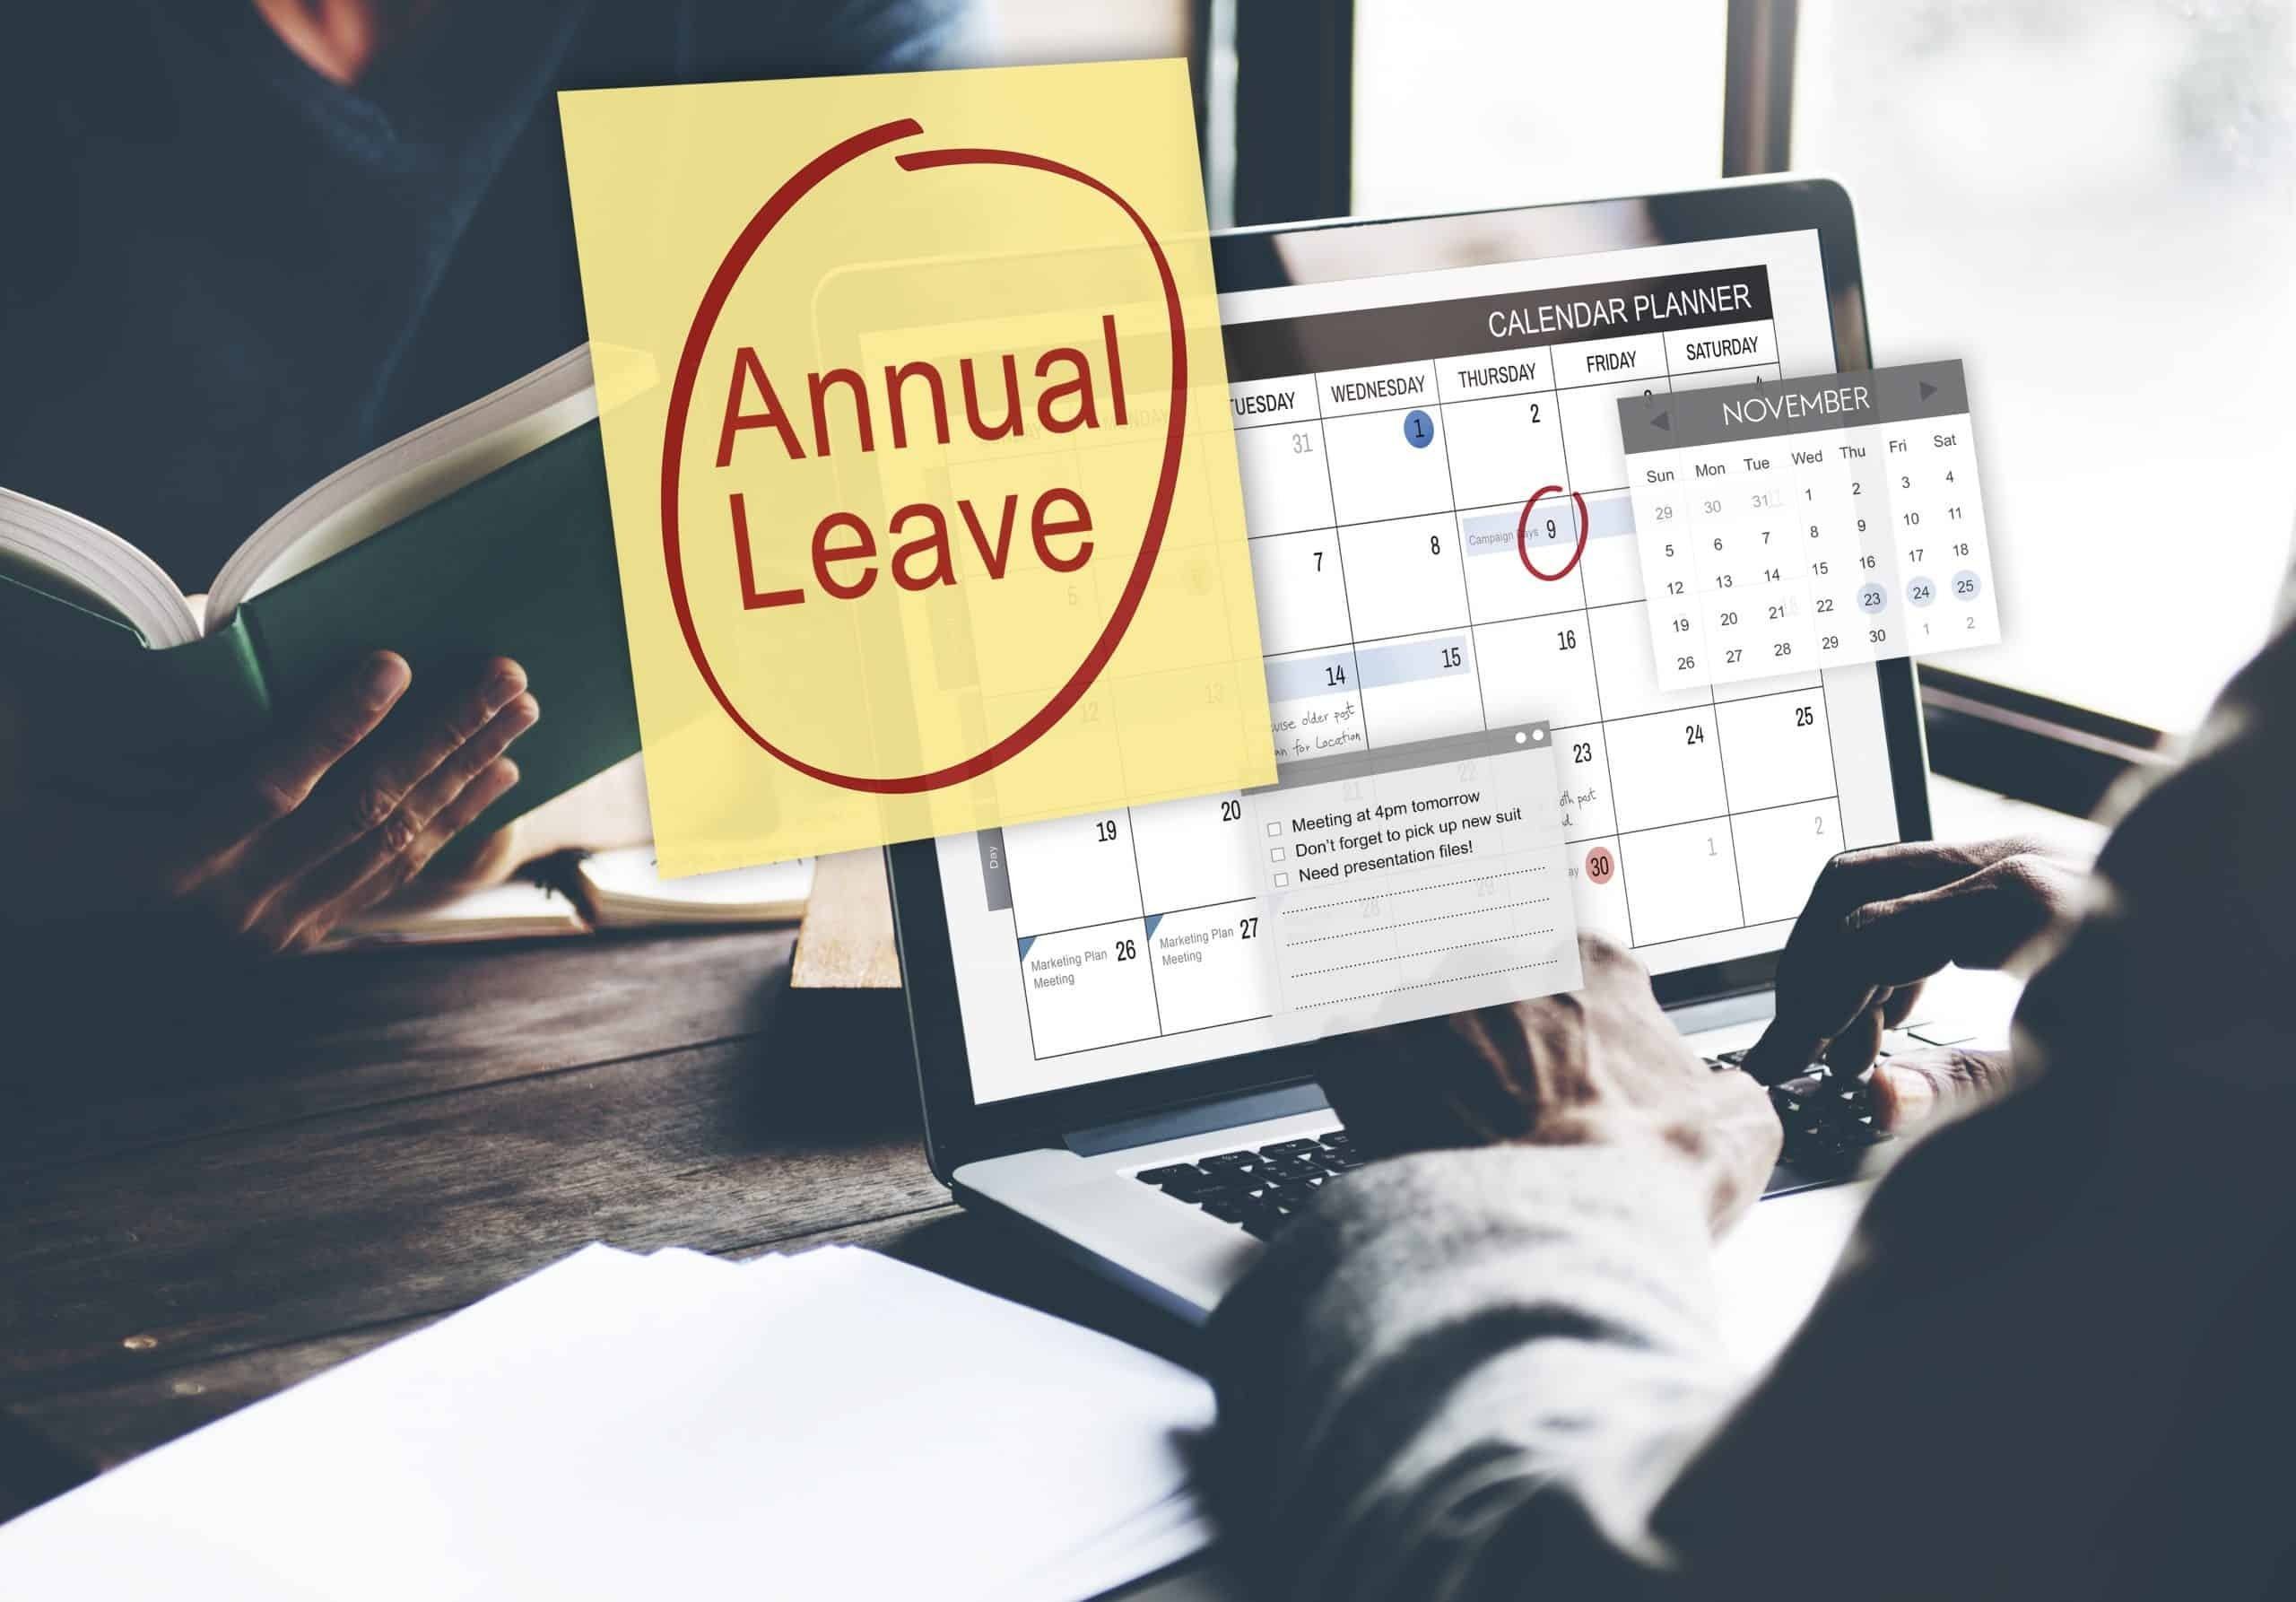 2021 Federal Leave Chart / Record / Calendar